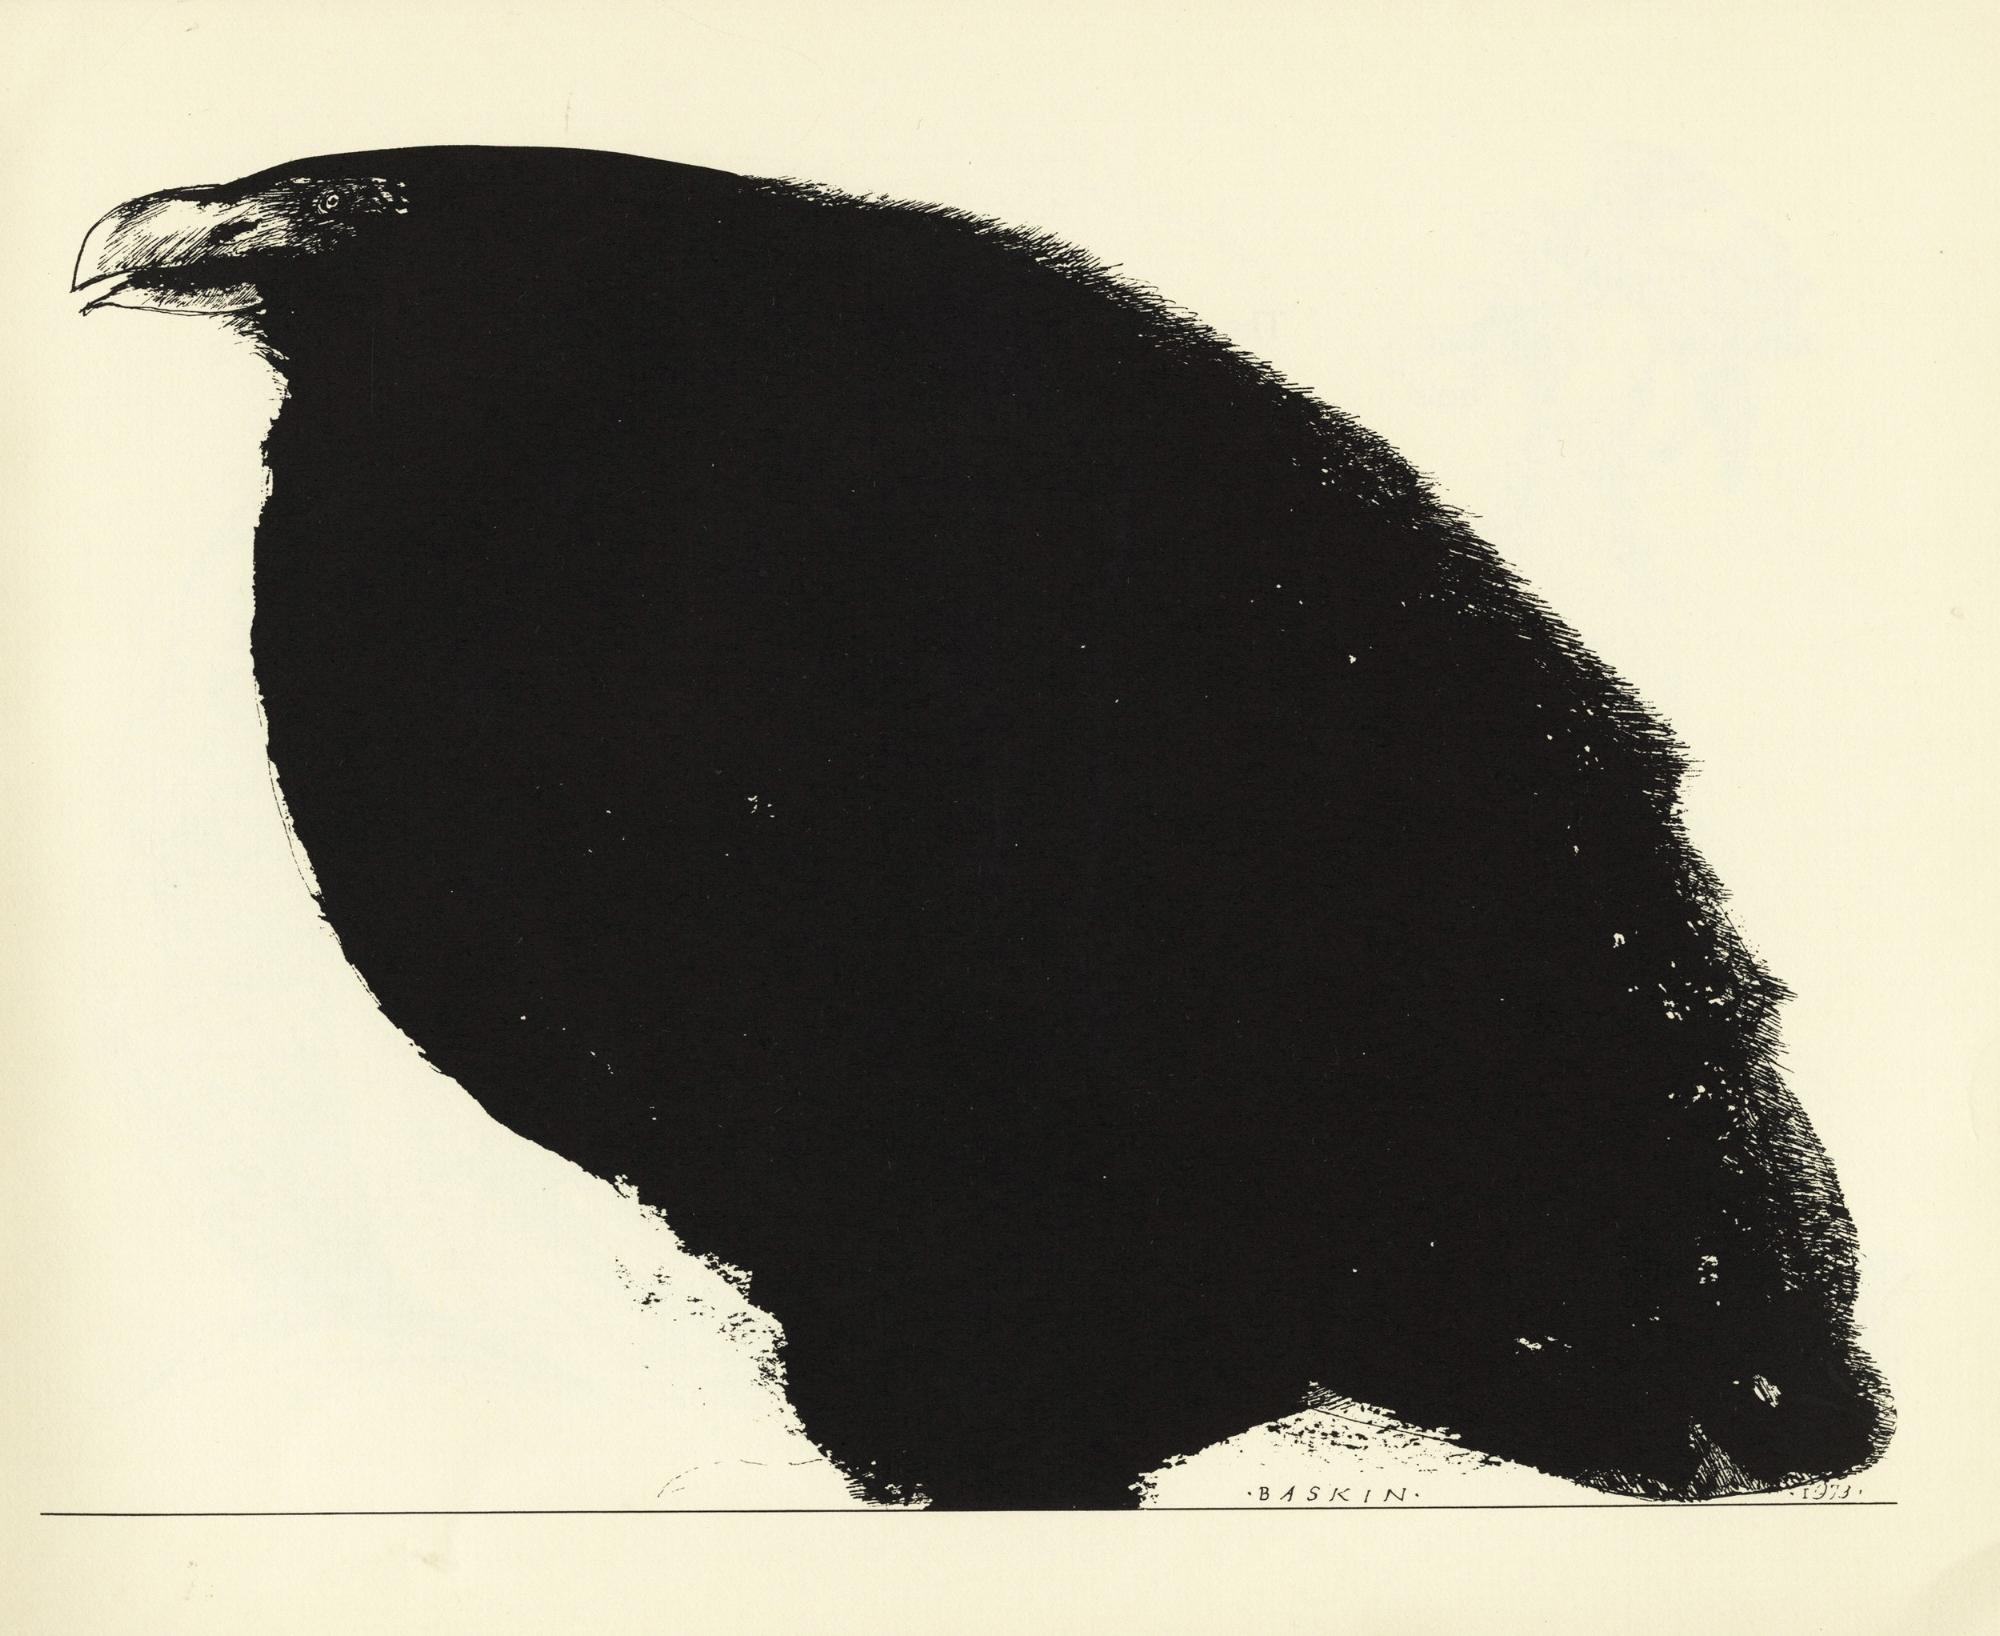 Illustration for Cave Birds - Leonard Baskin